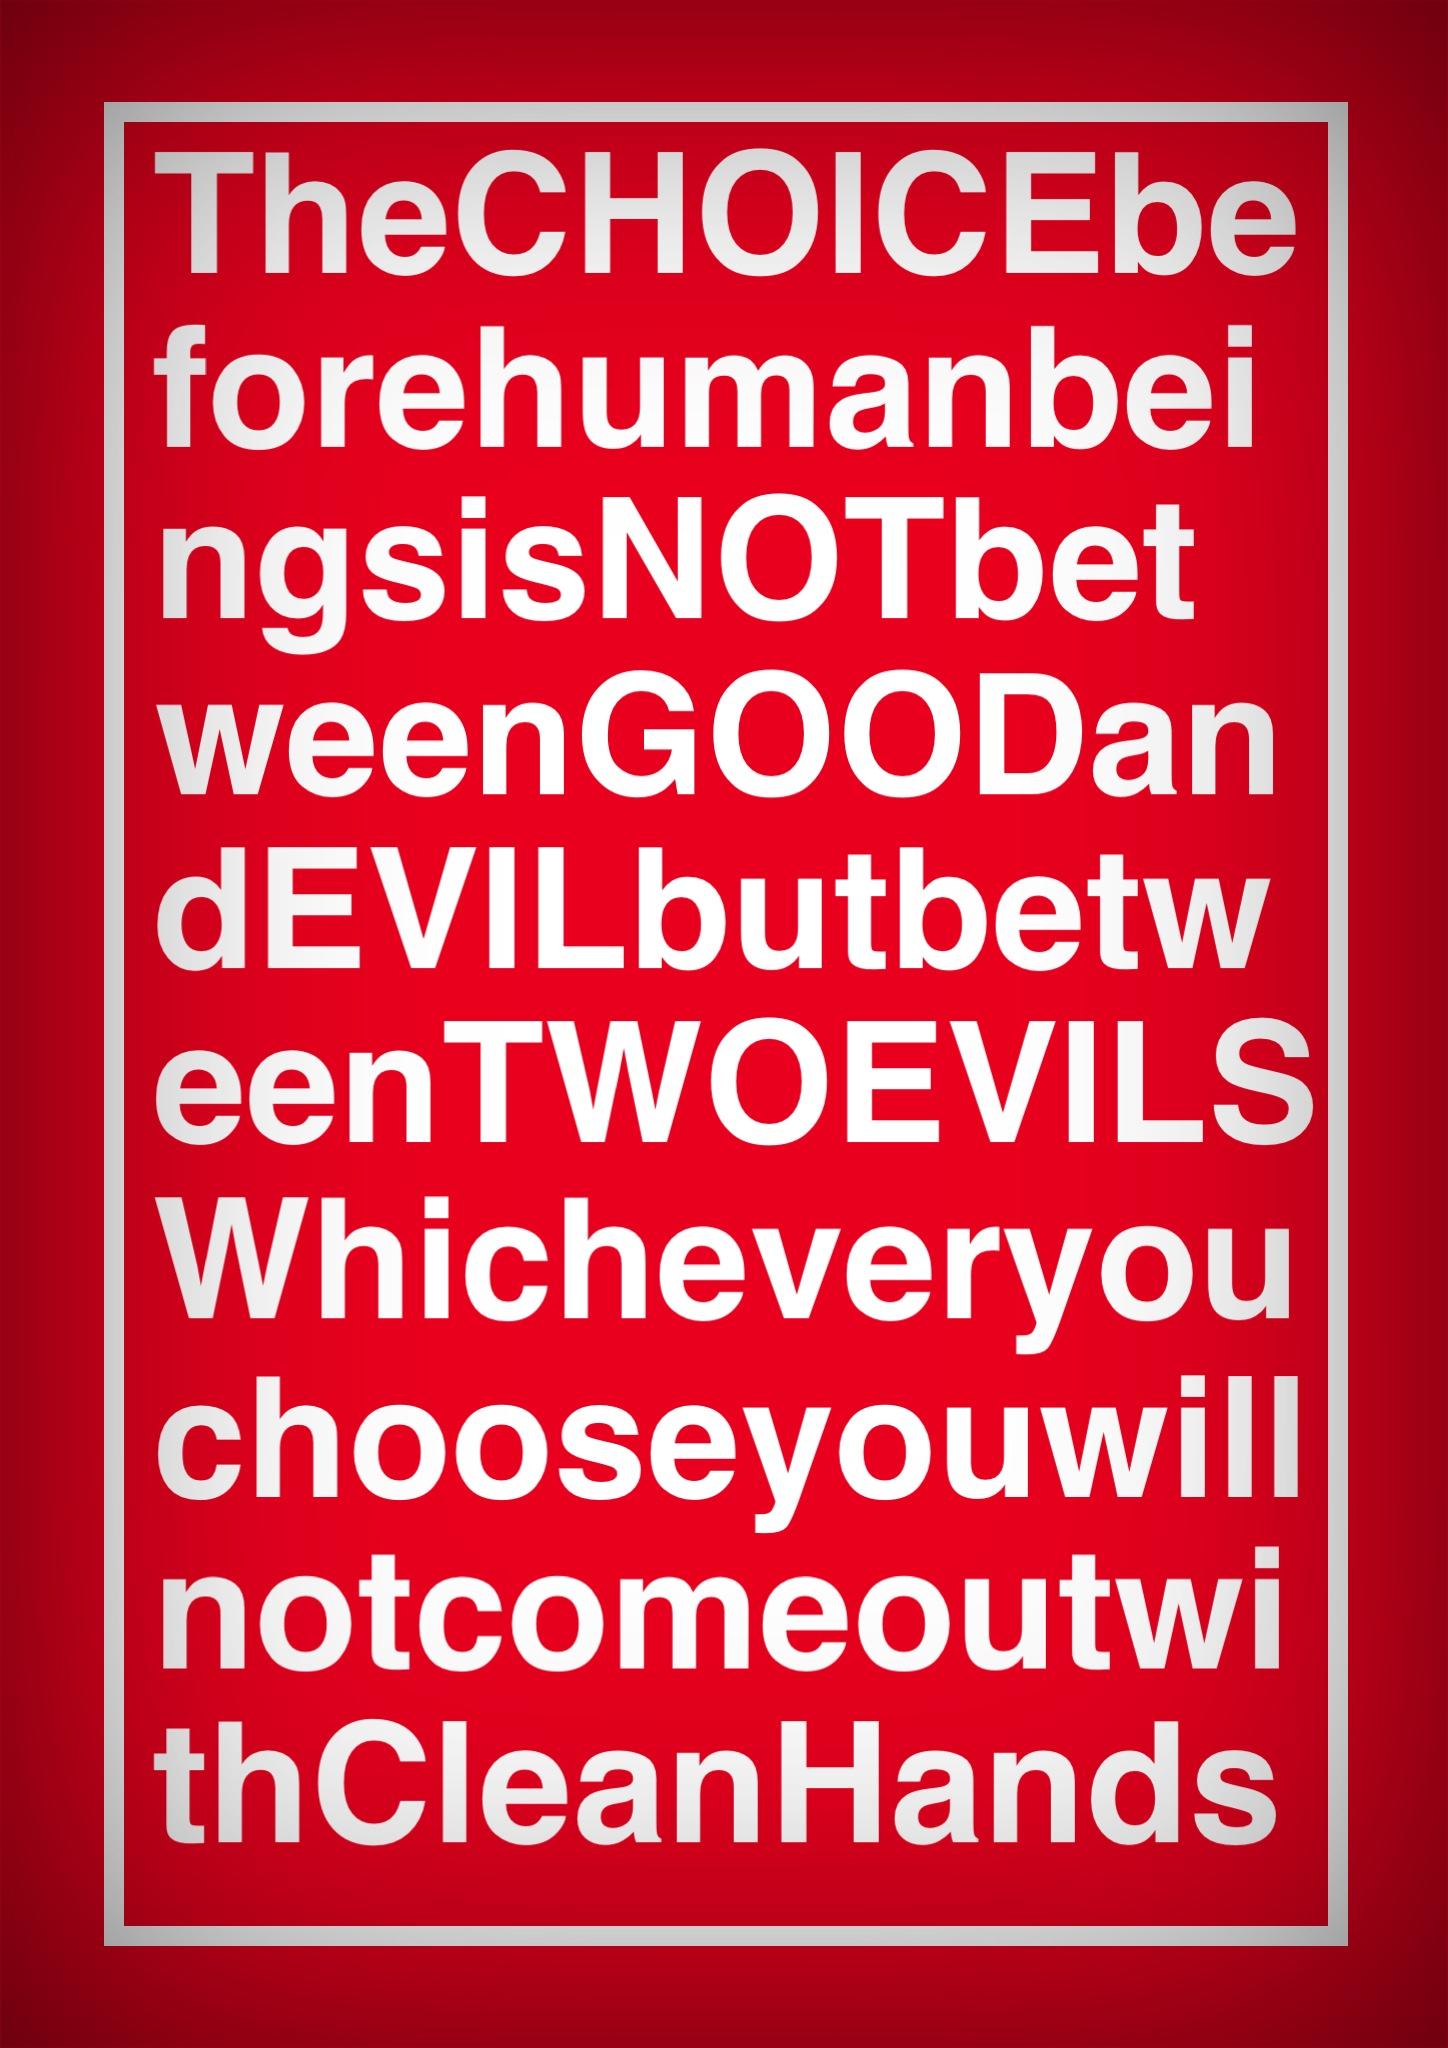 Good verses evil in day verses